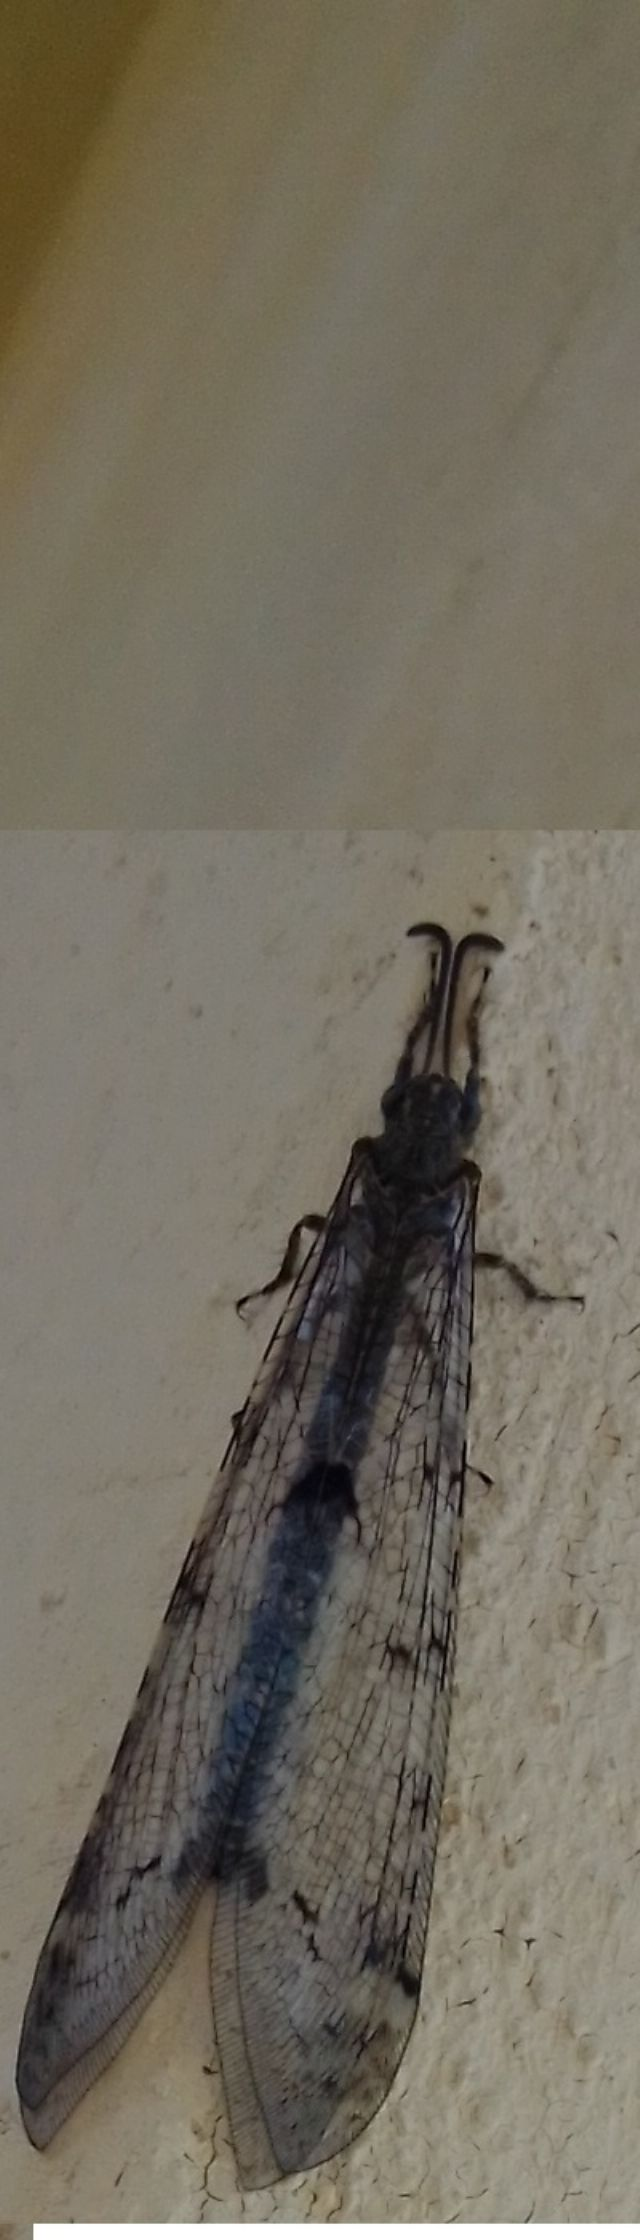 myrmeleontidae della Val Sesia: Distoleon tetragrammicus